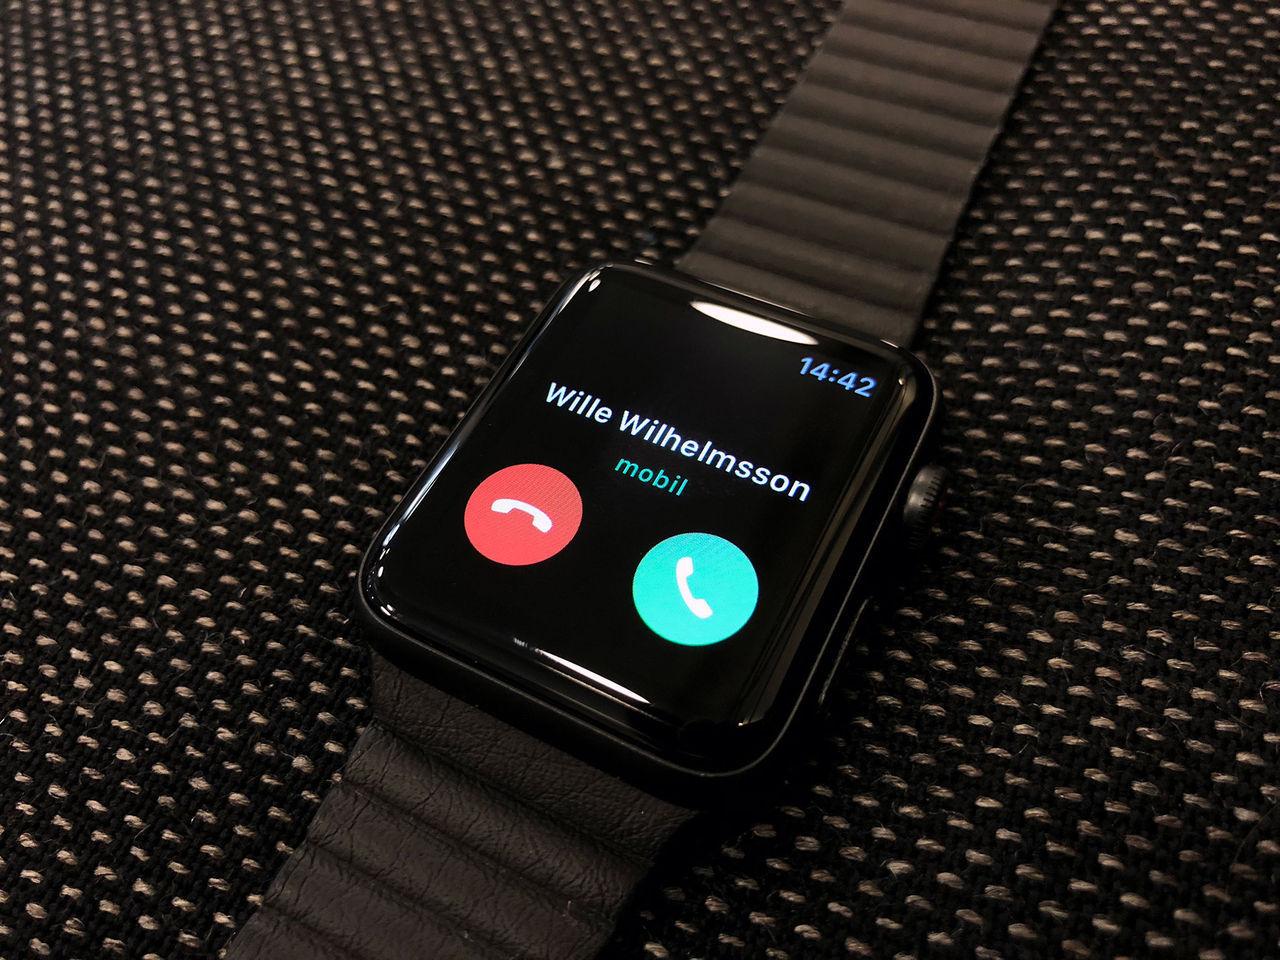 Apple Watch ryktas få en egen App Store